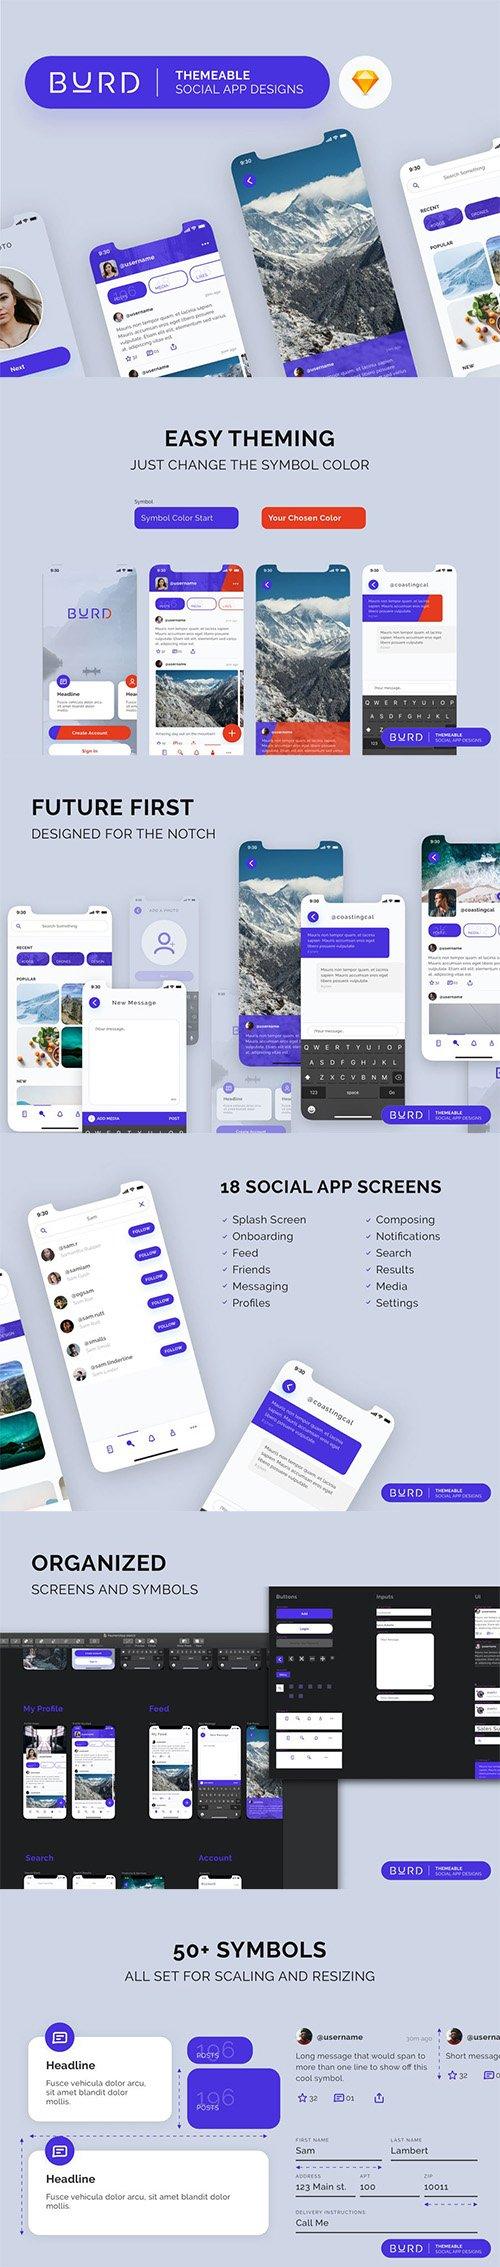 Burd Sketch Social UI Kit